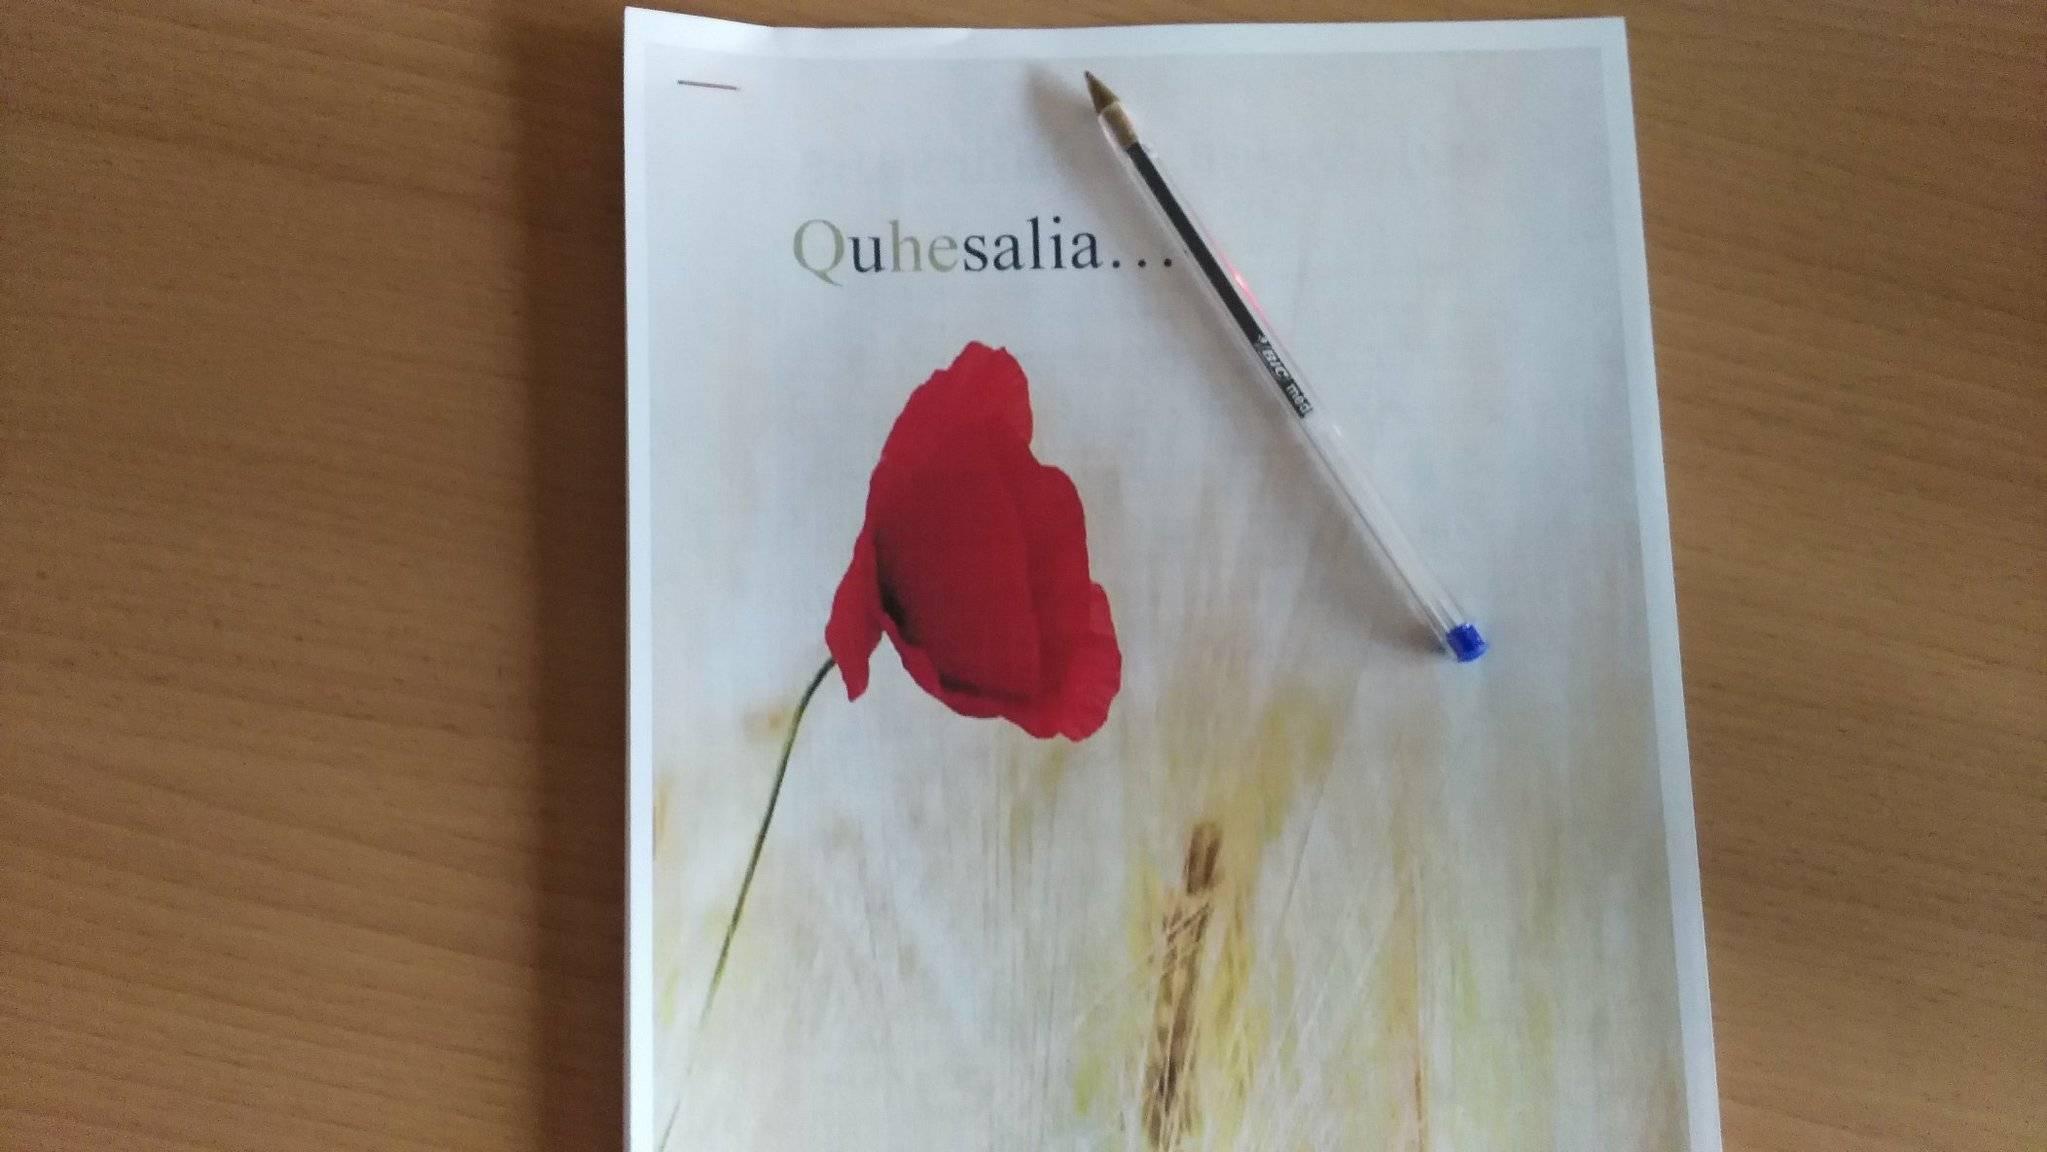 "proyecto quhesalia - Mancha Norte da luz verde al proyecto ""Quhesalia"""